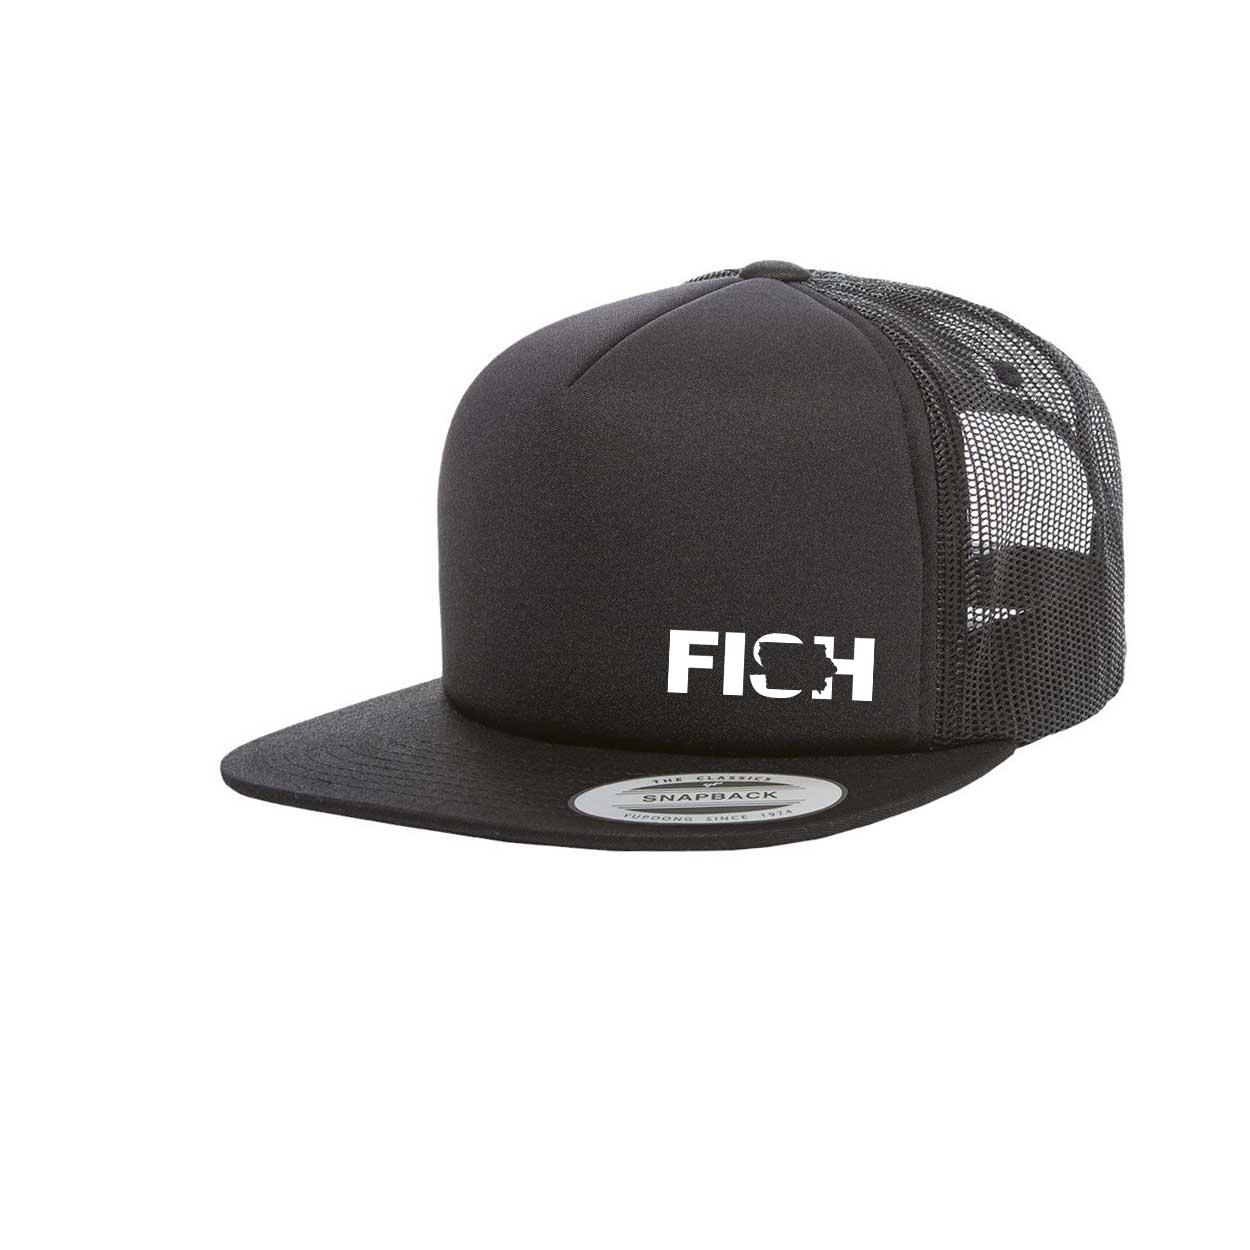 Fish Iowa Night Out Premium Foam Flat Brim Snapback Hat Black (White Logo)